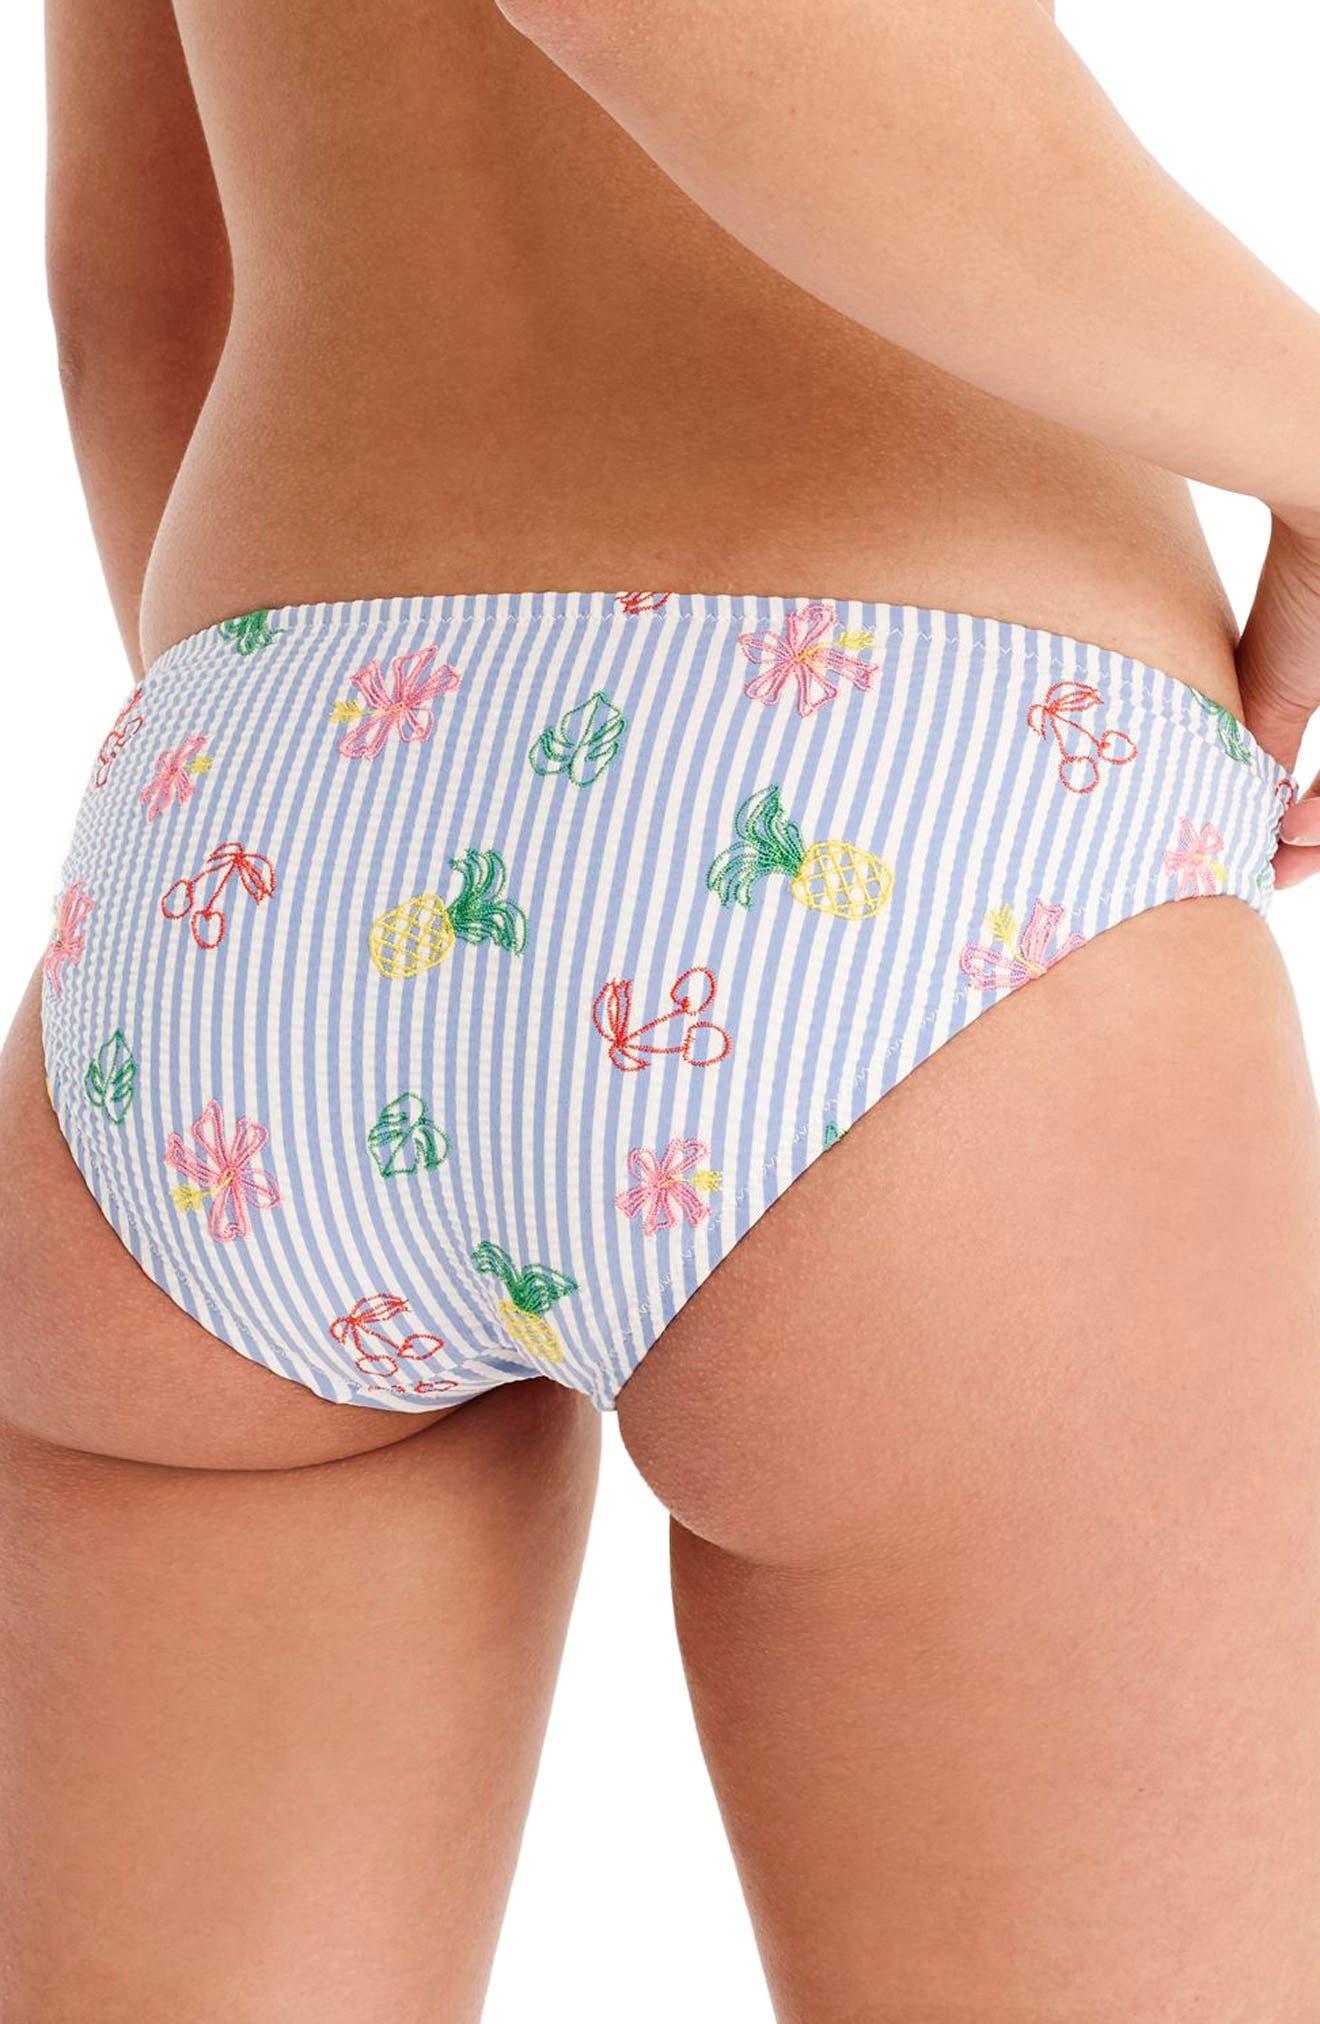 Seersucker Surf Hipster Bikini Bottoms,                             Alternate thumbnail 2, color,                             Fruity Multi